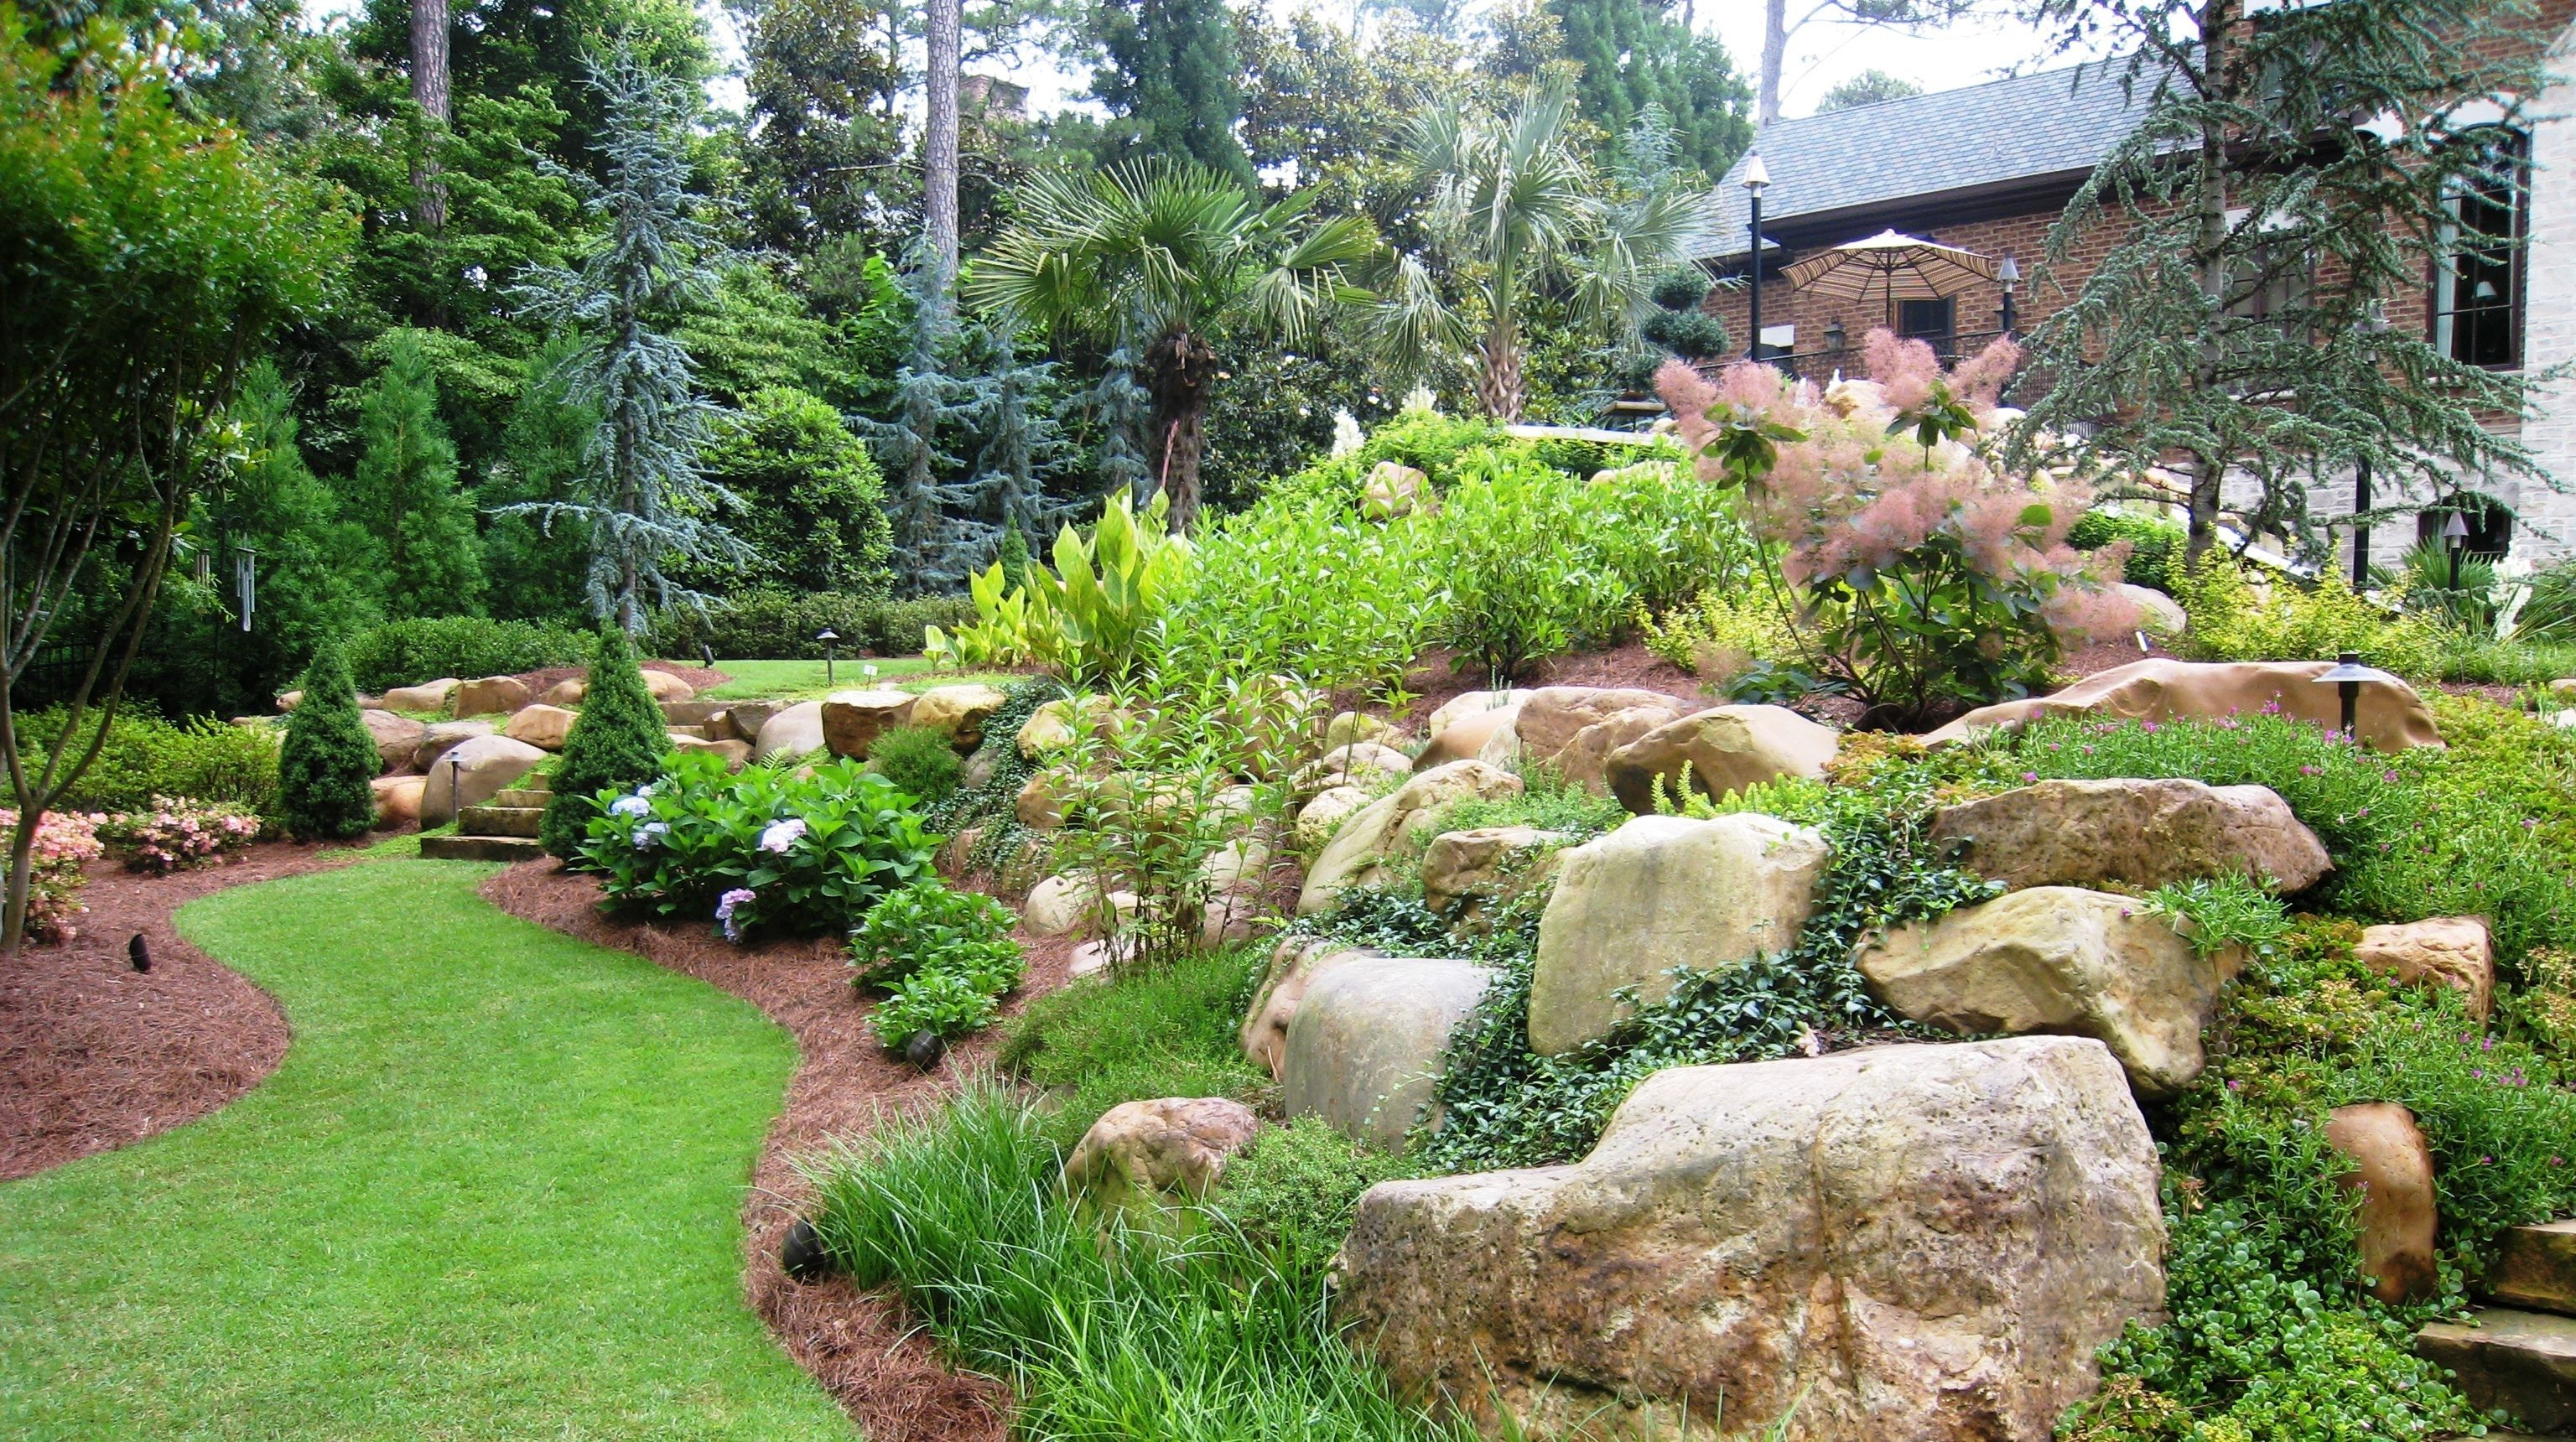 Hillside Landscaping With Boulders Landscaping Berm Ideas Landscaping With Boulders Large Backyard Landscaping